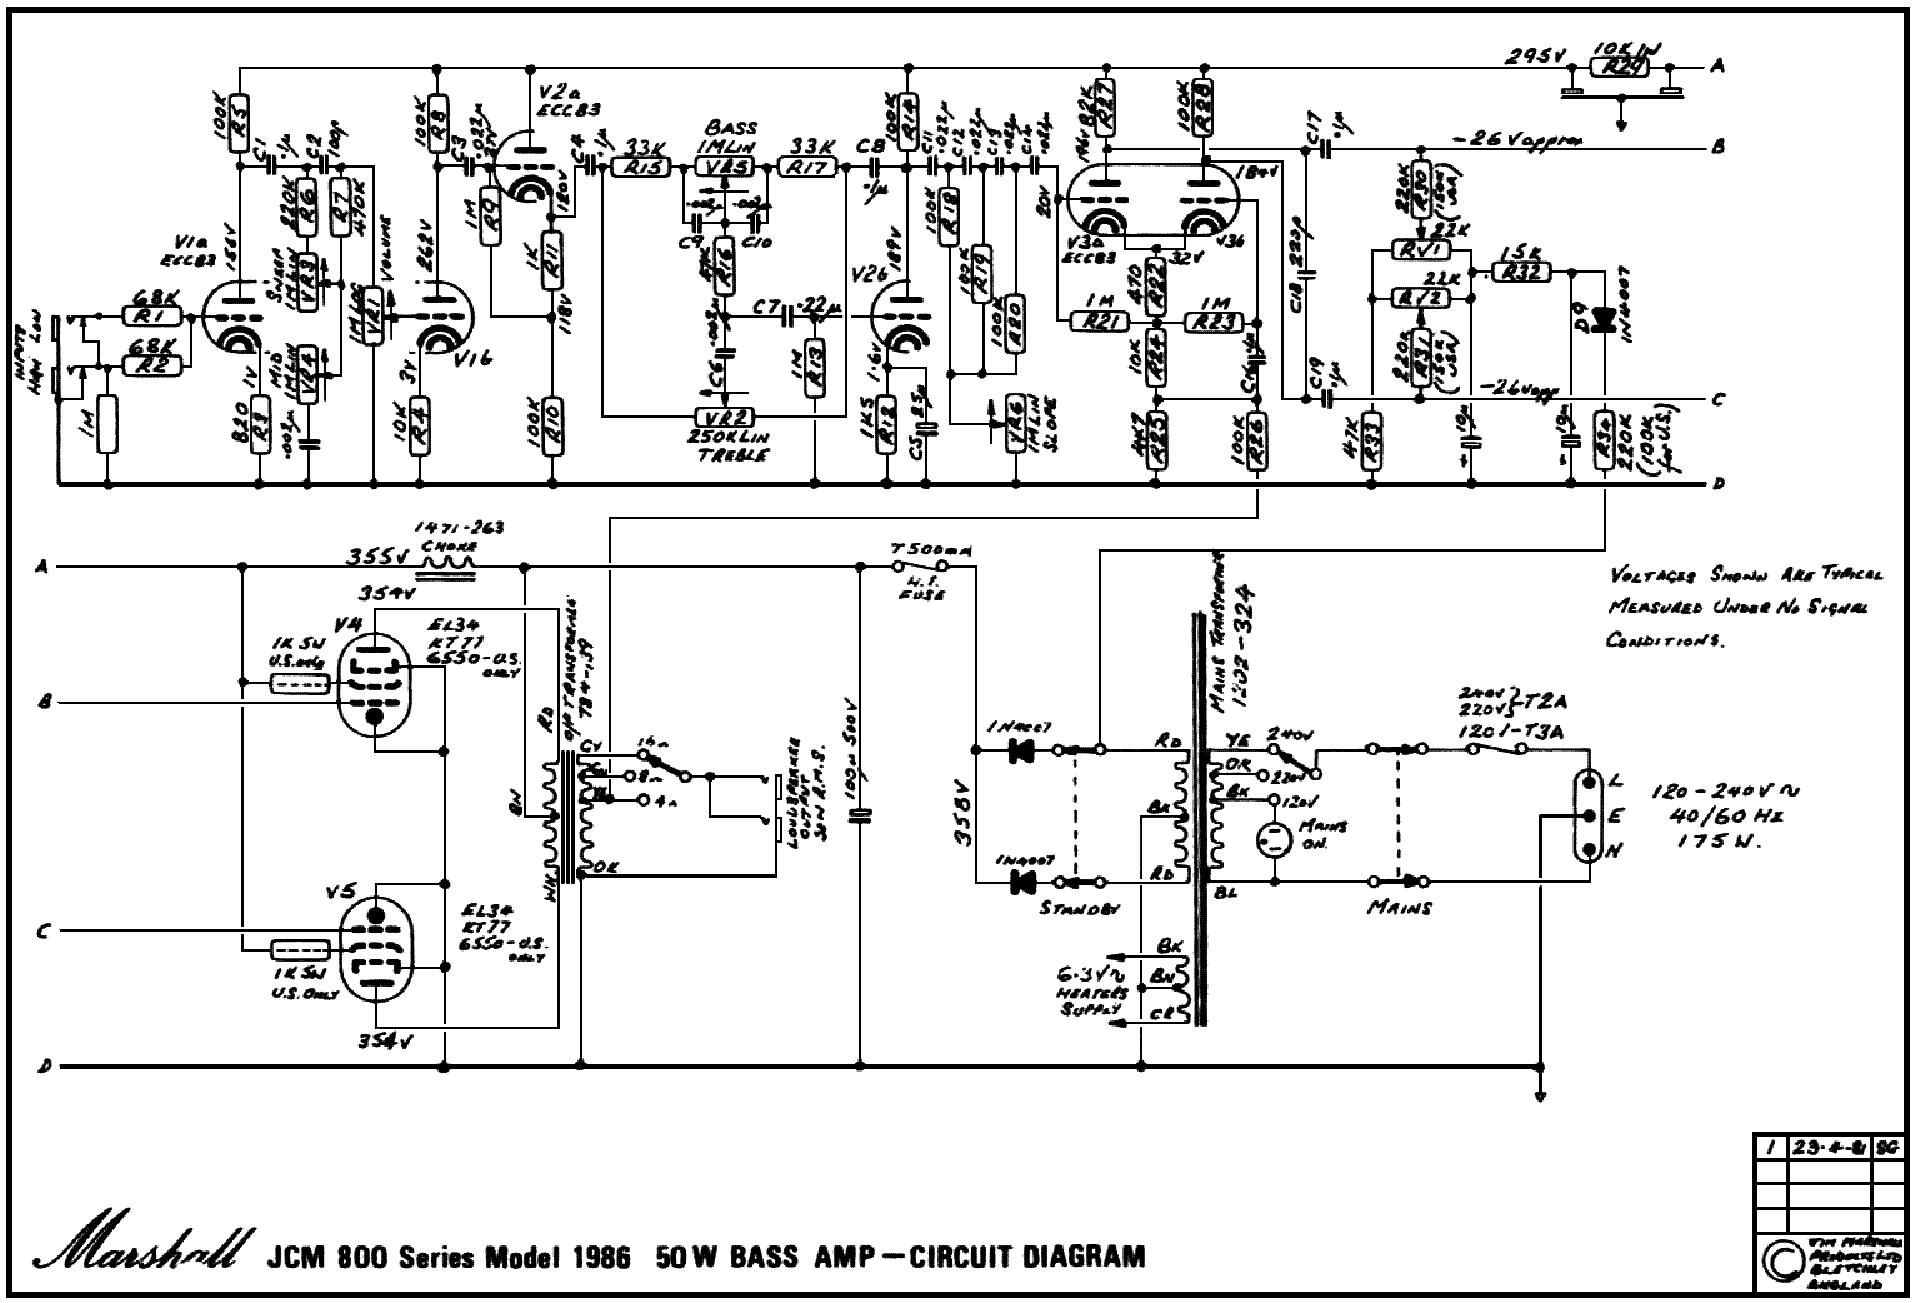 marshall jcm 800 model 2210 manual